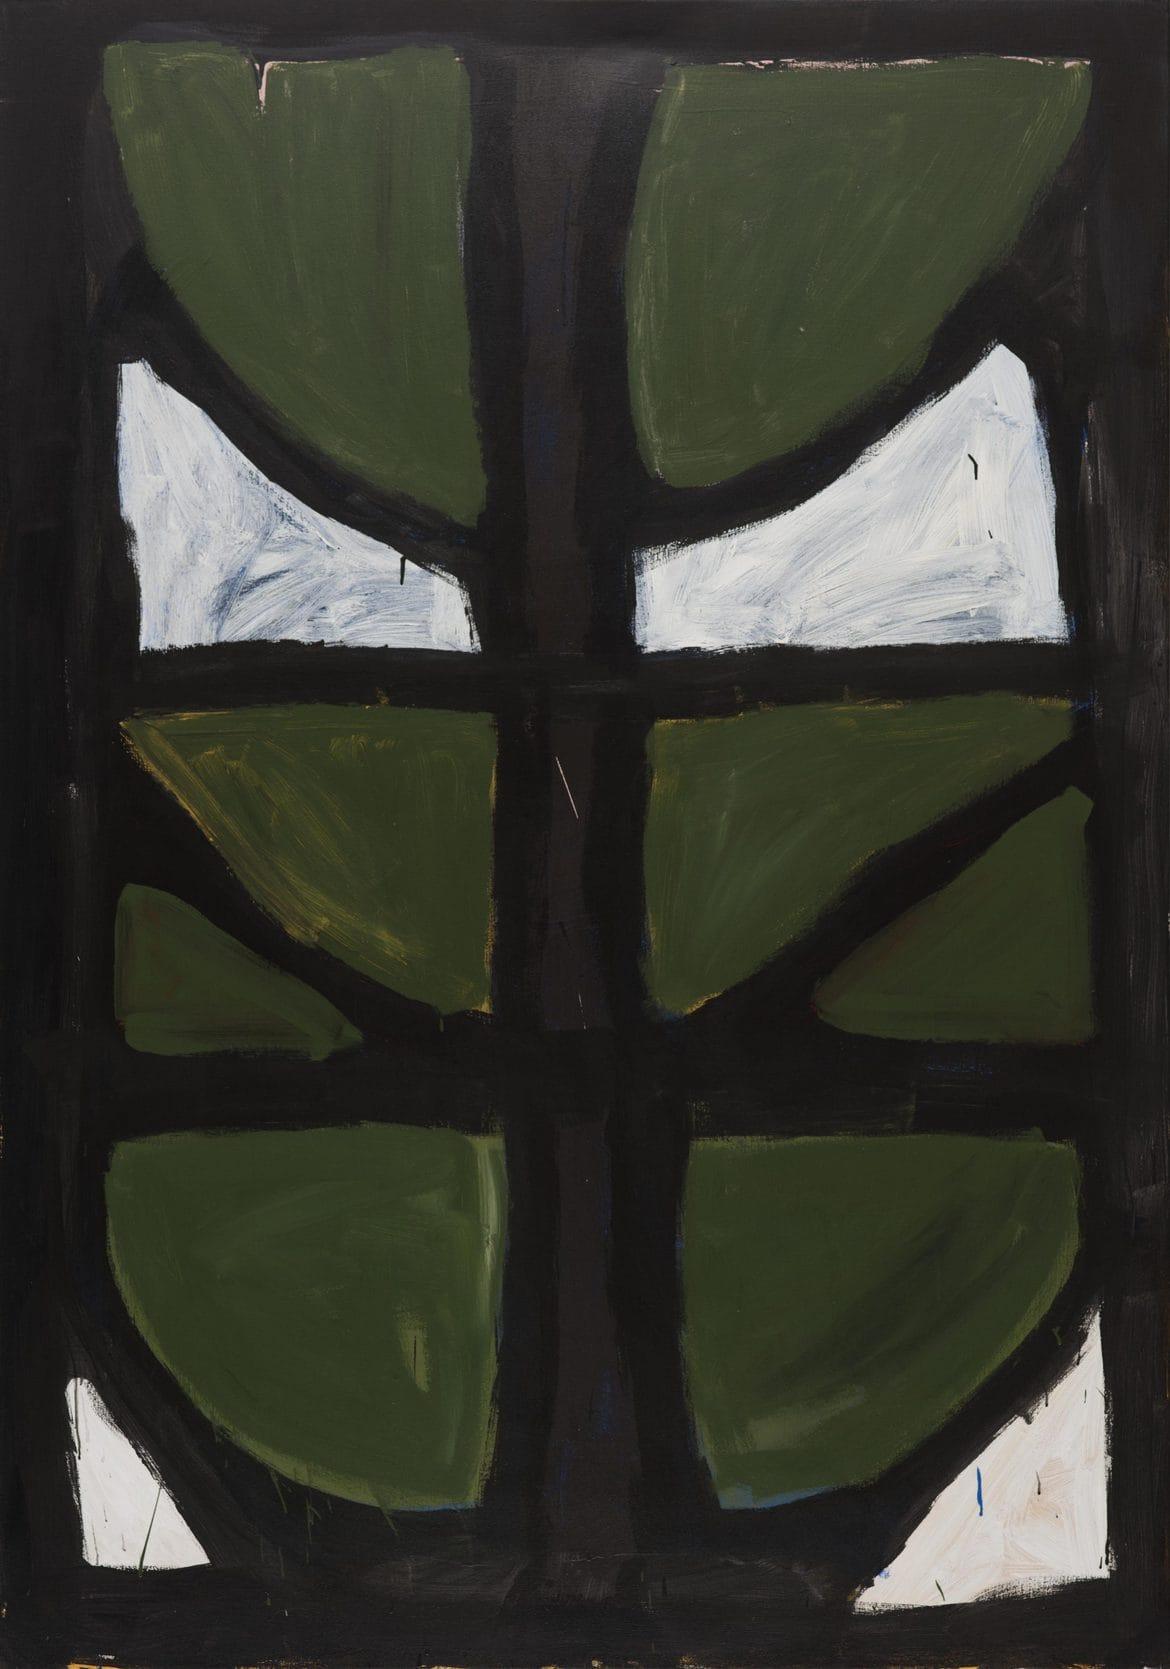 Lottie Consalvo, 'Anchoring The Collapse', 2019, 200cm x 140cm, acrylic on canvas